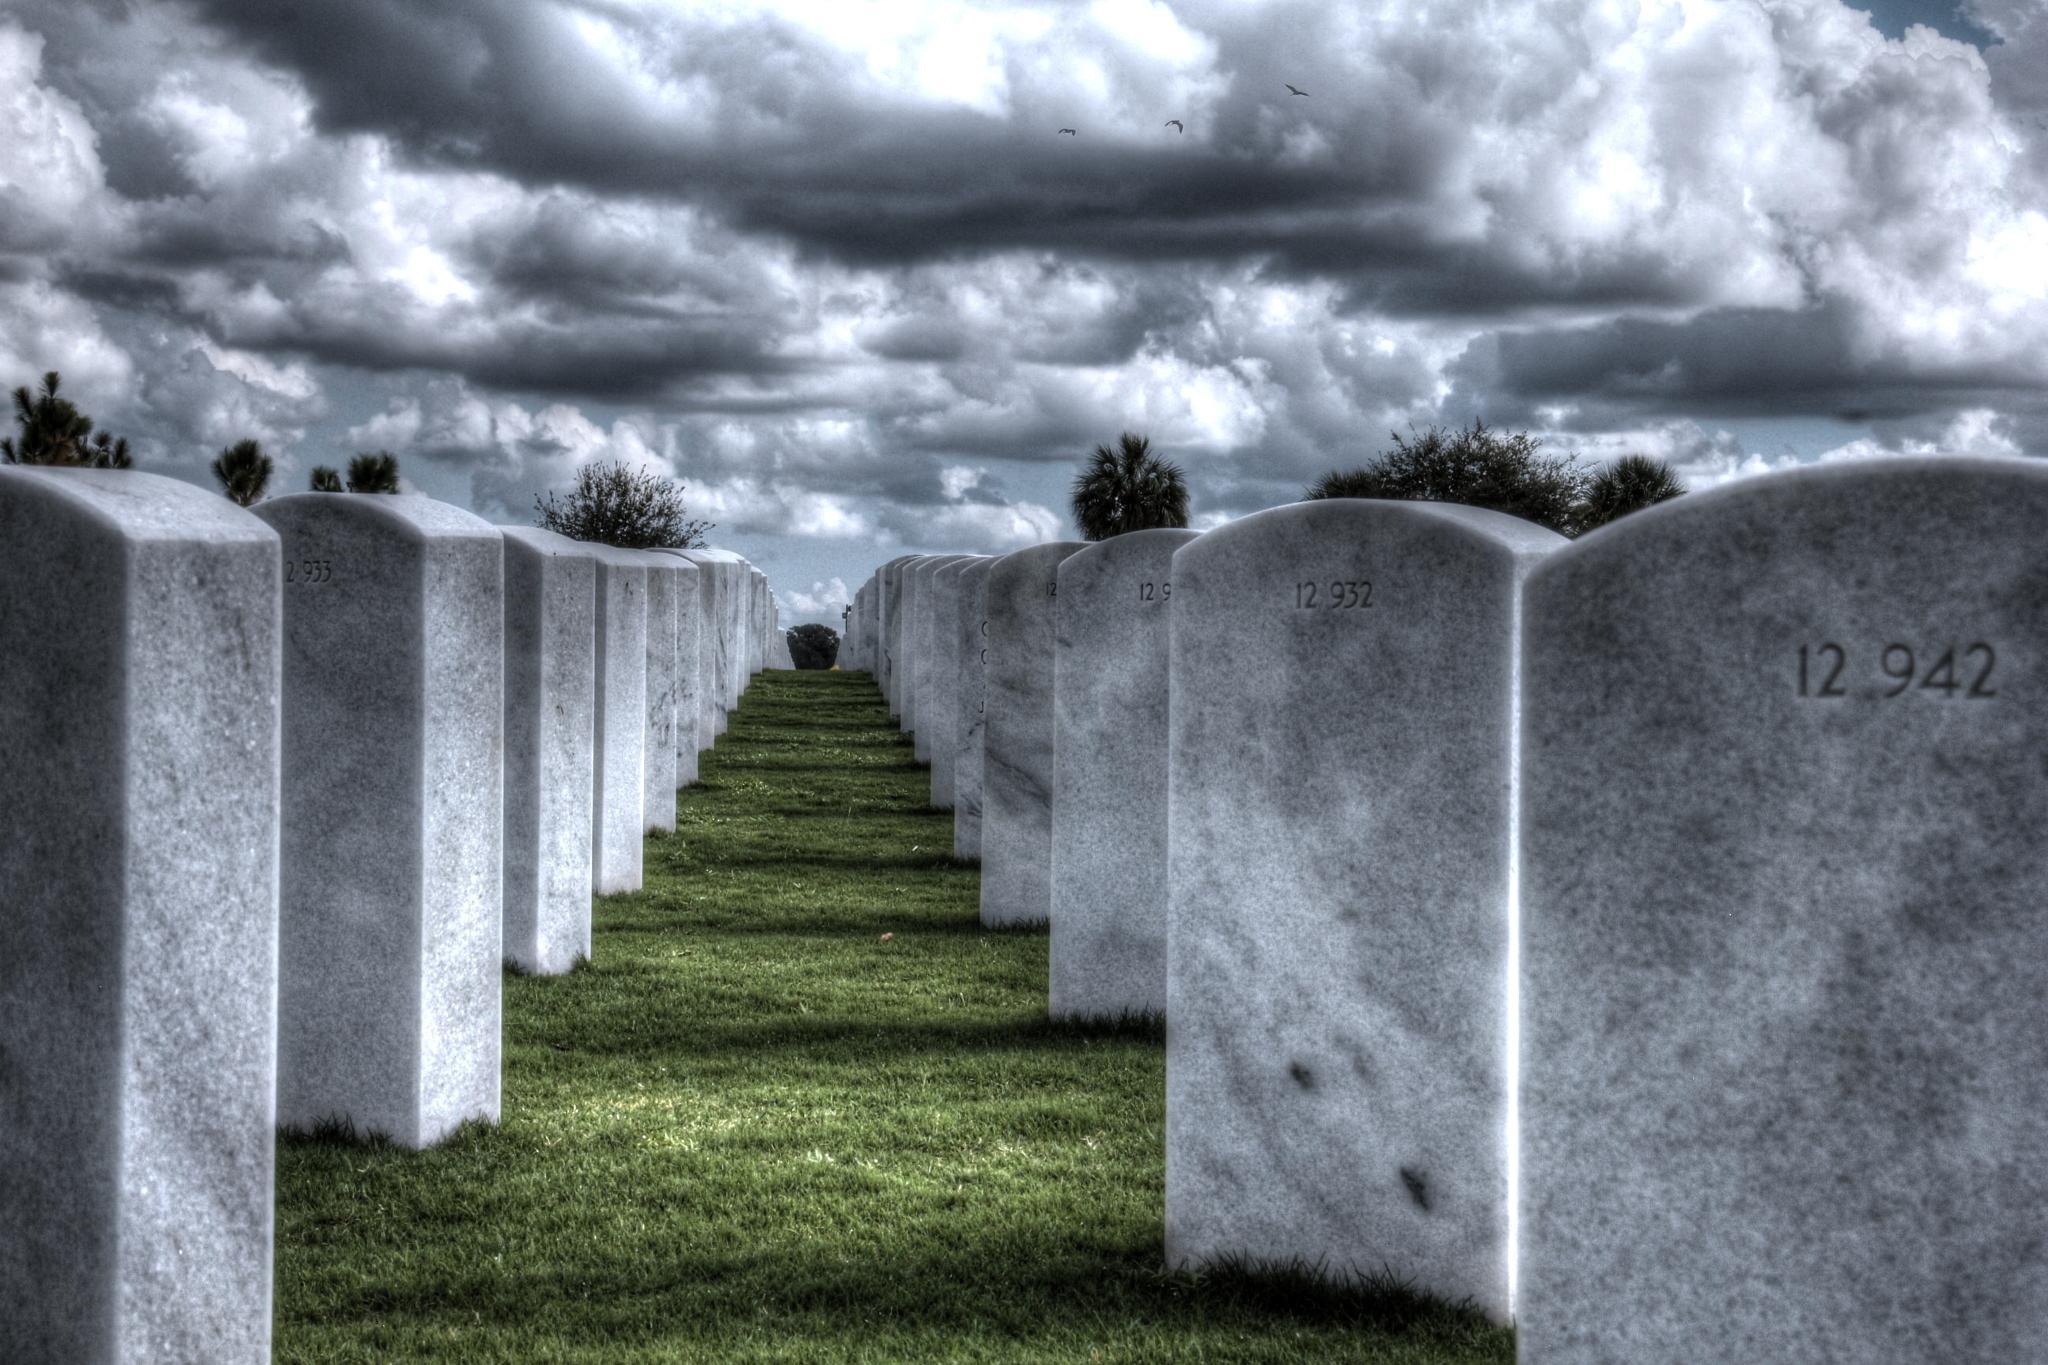 Surreal Graveyard by Tcko